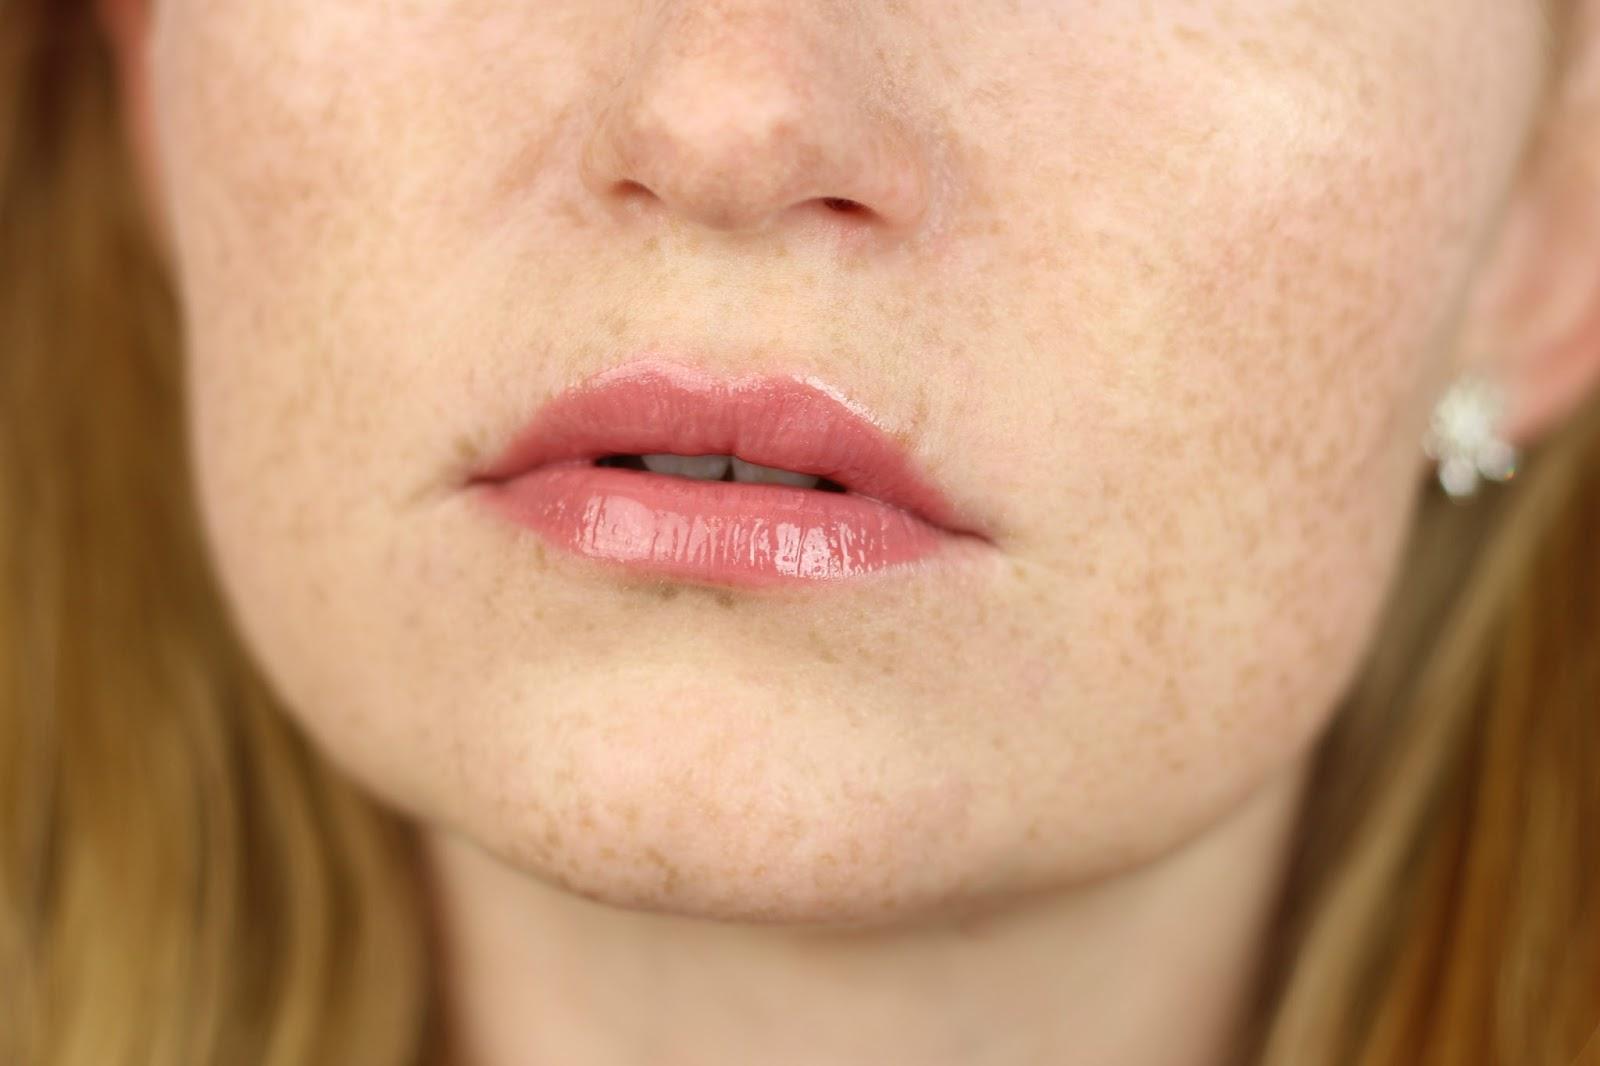 beauty, cosmetics, cremig, drogerie, essence, farbtrends, frühjahr, glanz, glänzende lippen, neues sortiment 2017, review, rosa, sammlung, schimmer, shine shine shine lipgloss, sommer, swatches, tragebilder, wet look,